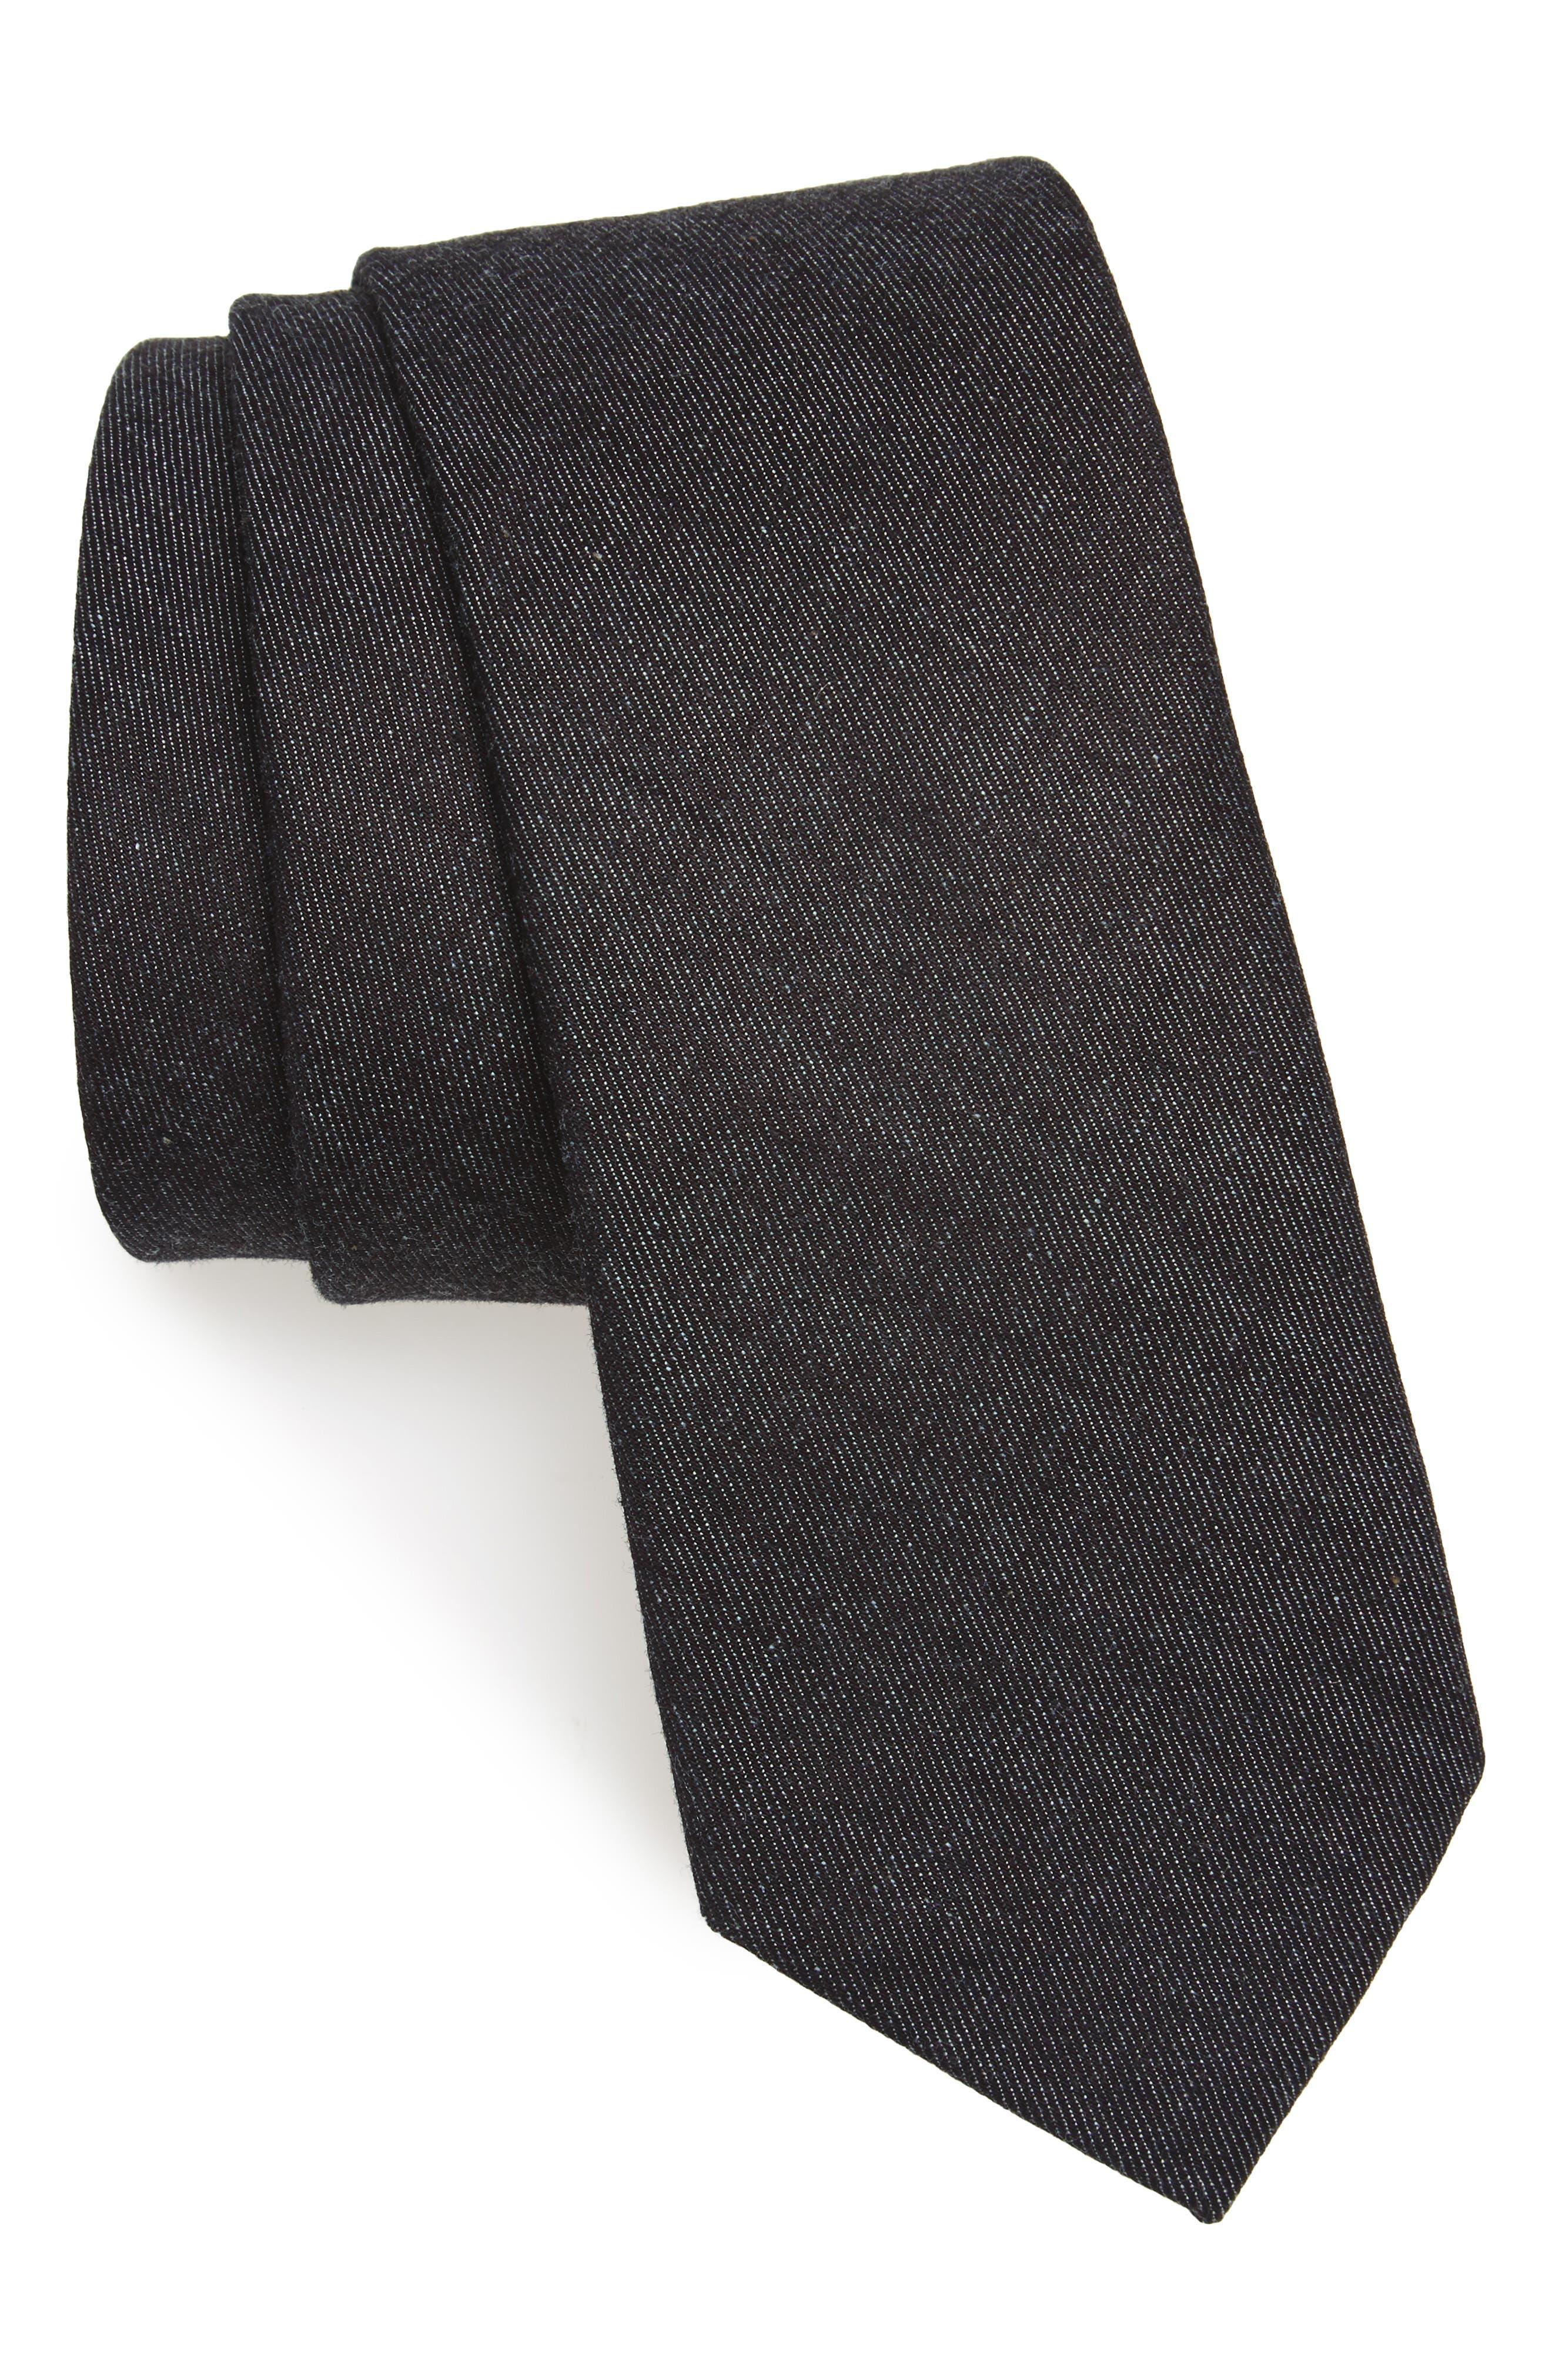 Bartlett Solid Cotton Tie,                             Main thumbnail 1, color,                             001